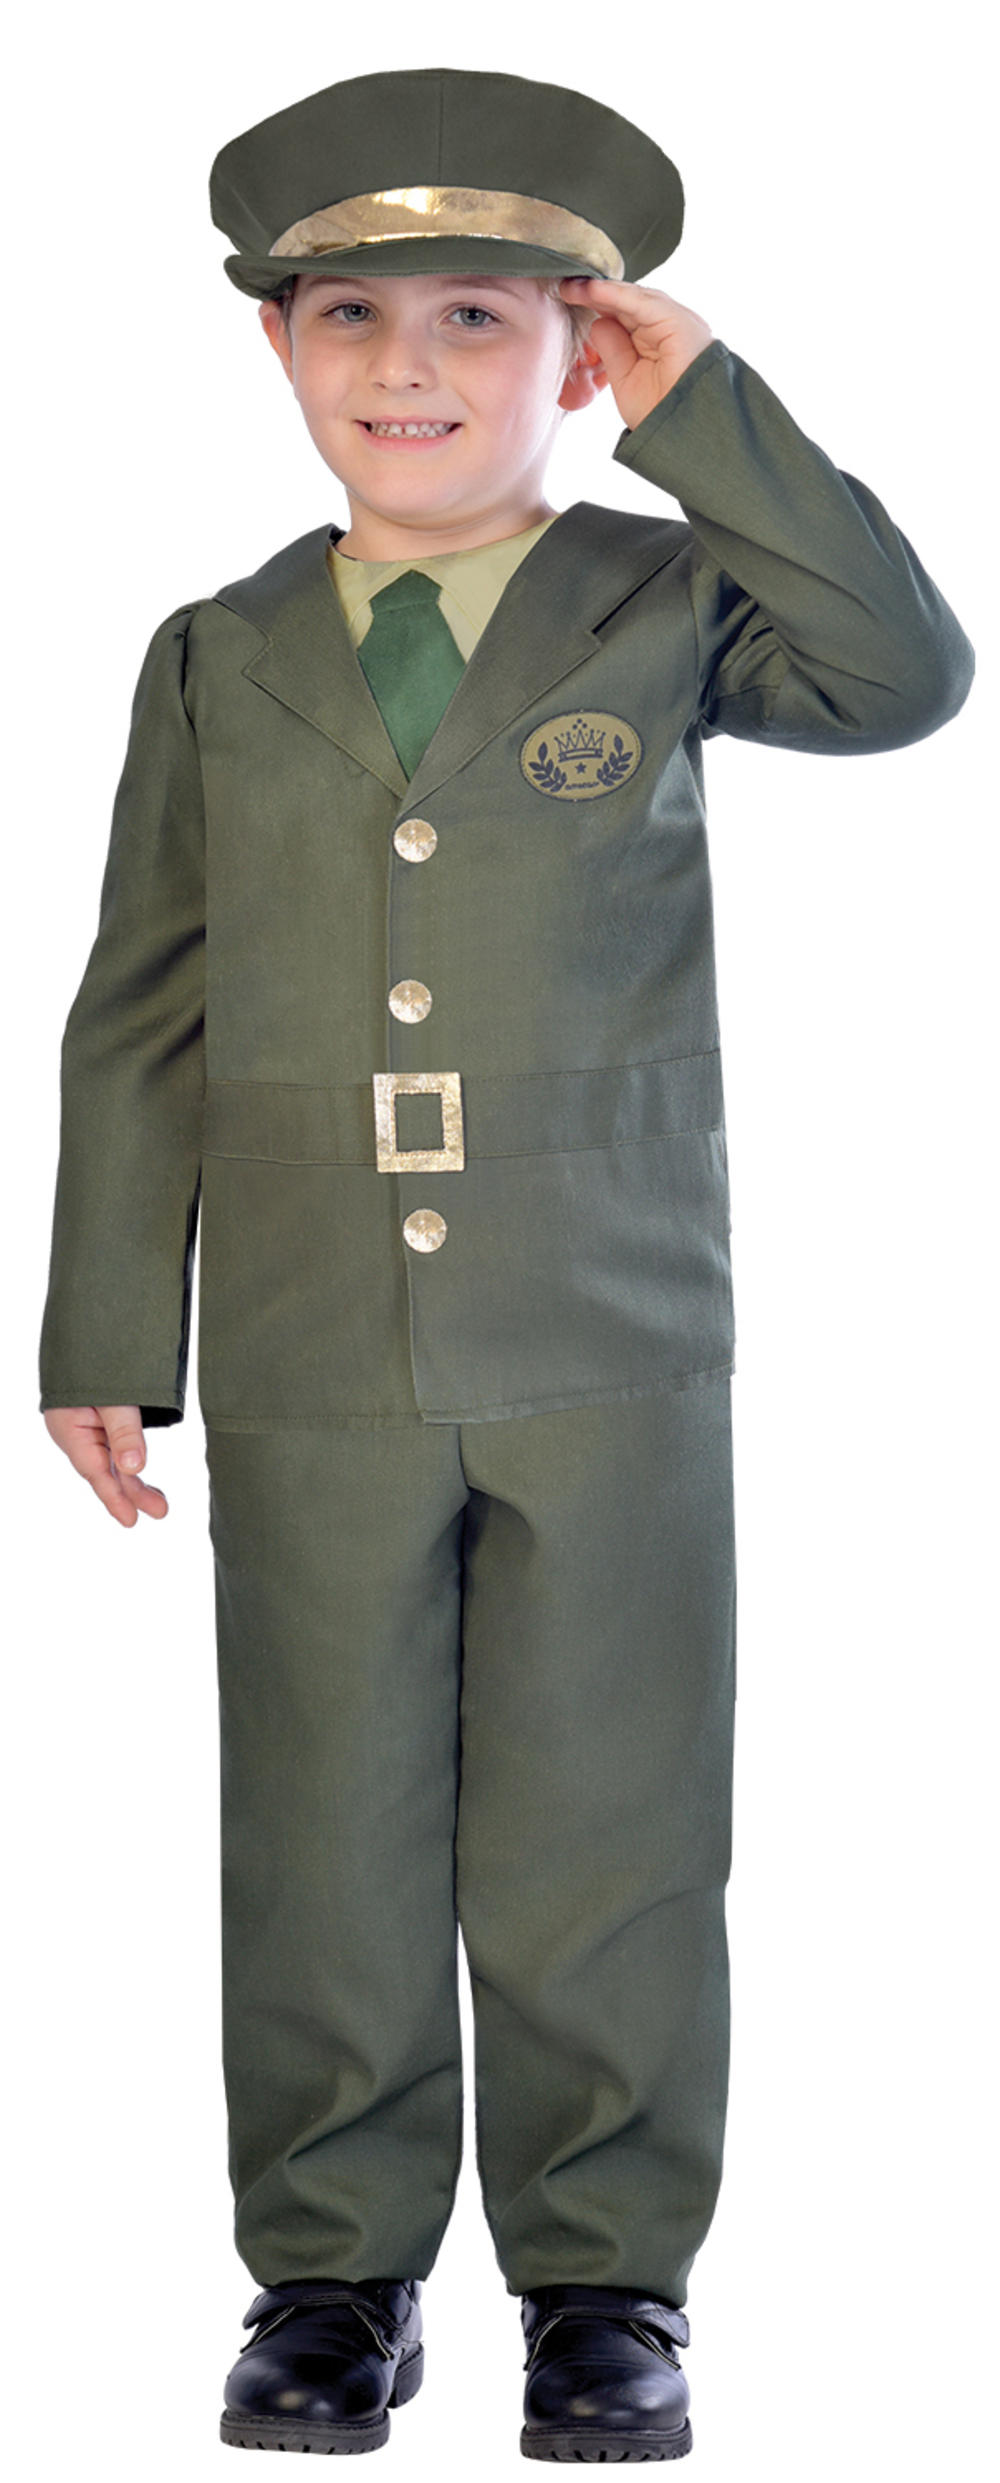 WW2 Soldier Boys Fancy Dress Military Army Wartime 30s 1940s Kids Childs Costume